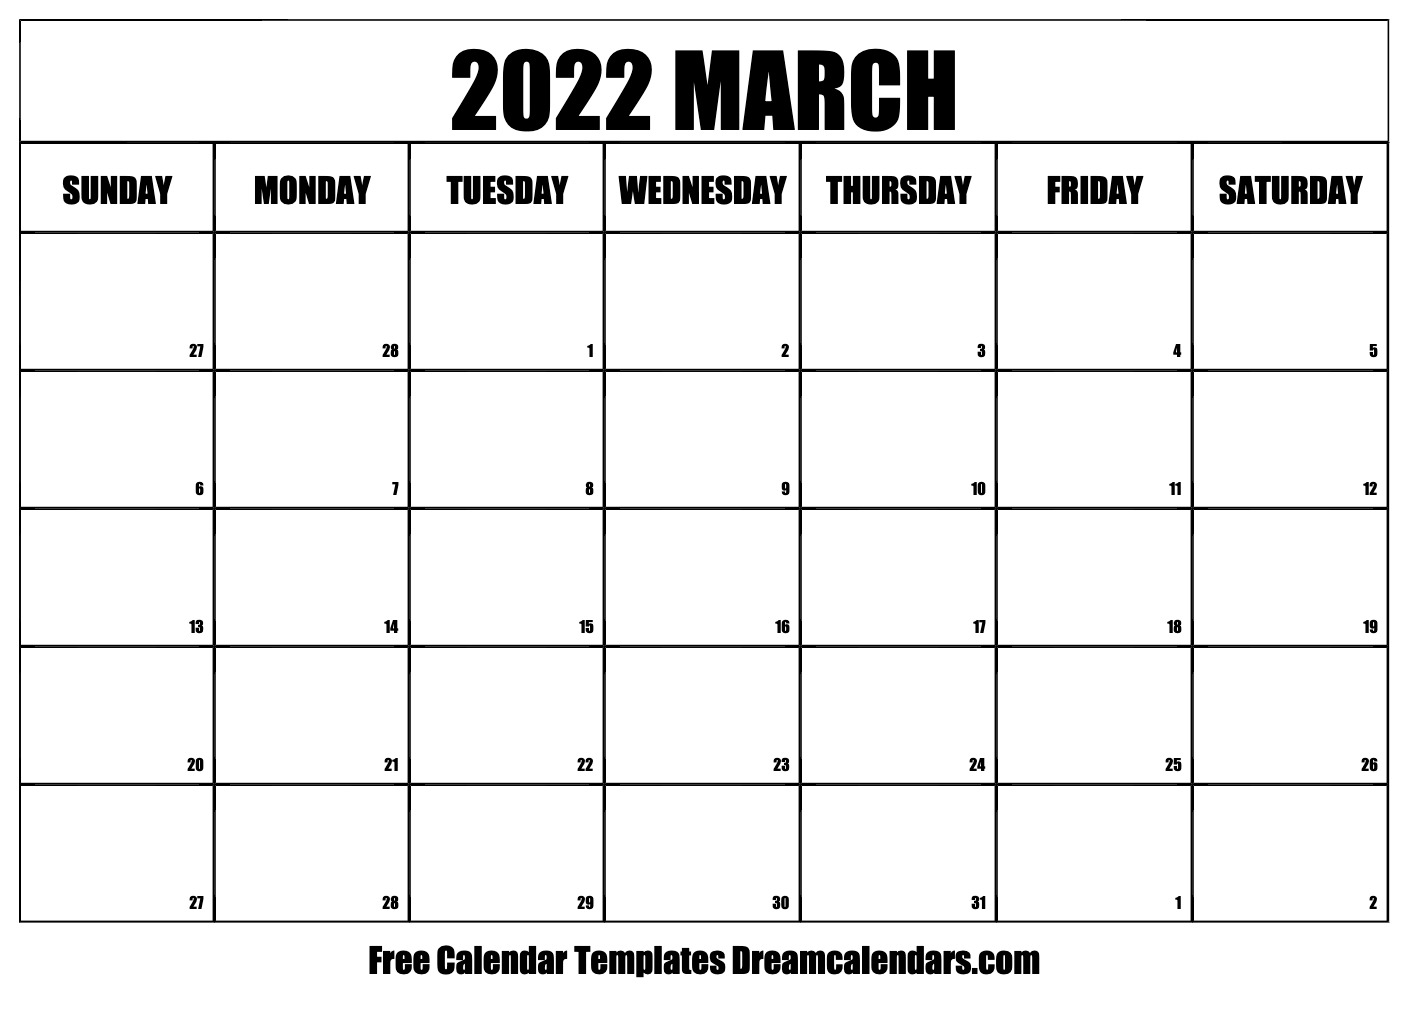 Womens March 2022 Calendar.March 2022 Calendar Free Blank Printable Templates